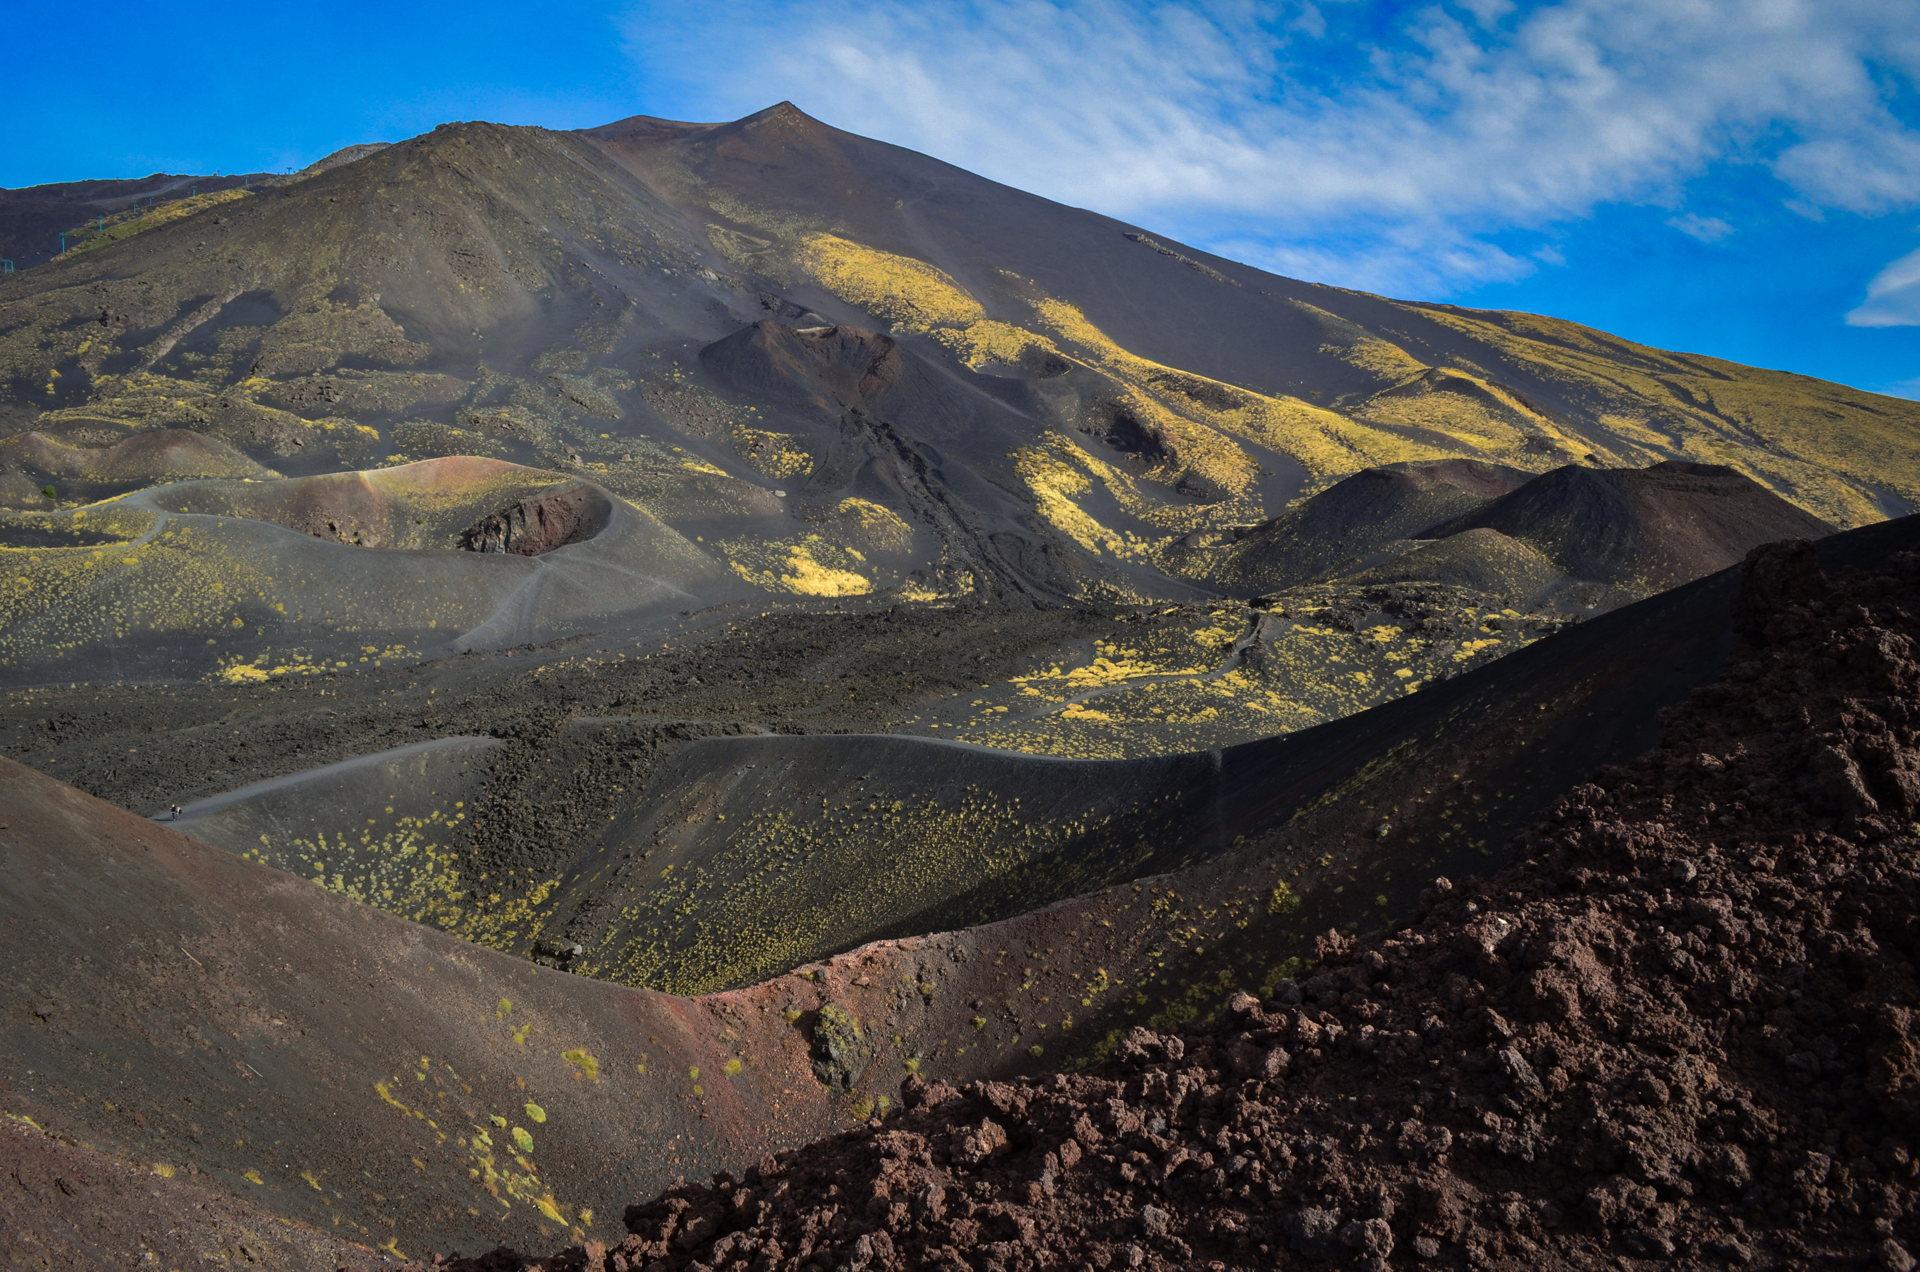 etna, etna travel, what to do in sicily, best places to visit in sicily, sicily travel, sicily backpacking